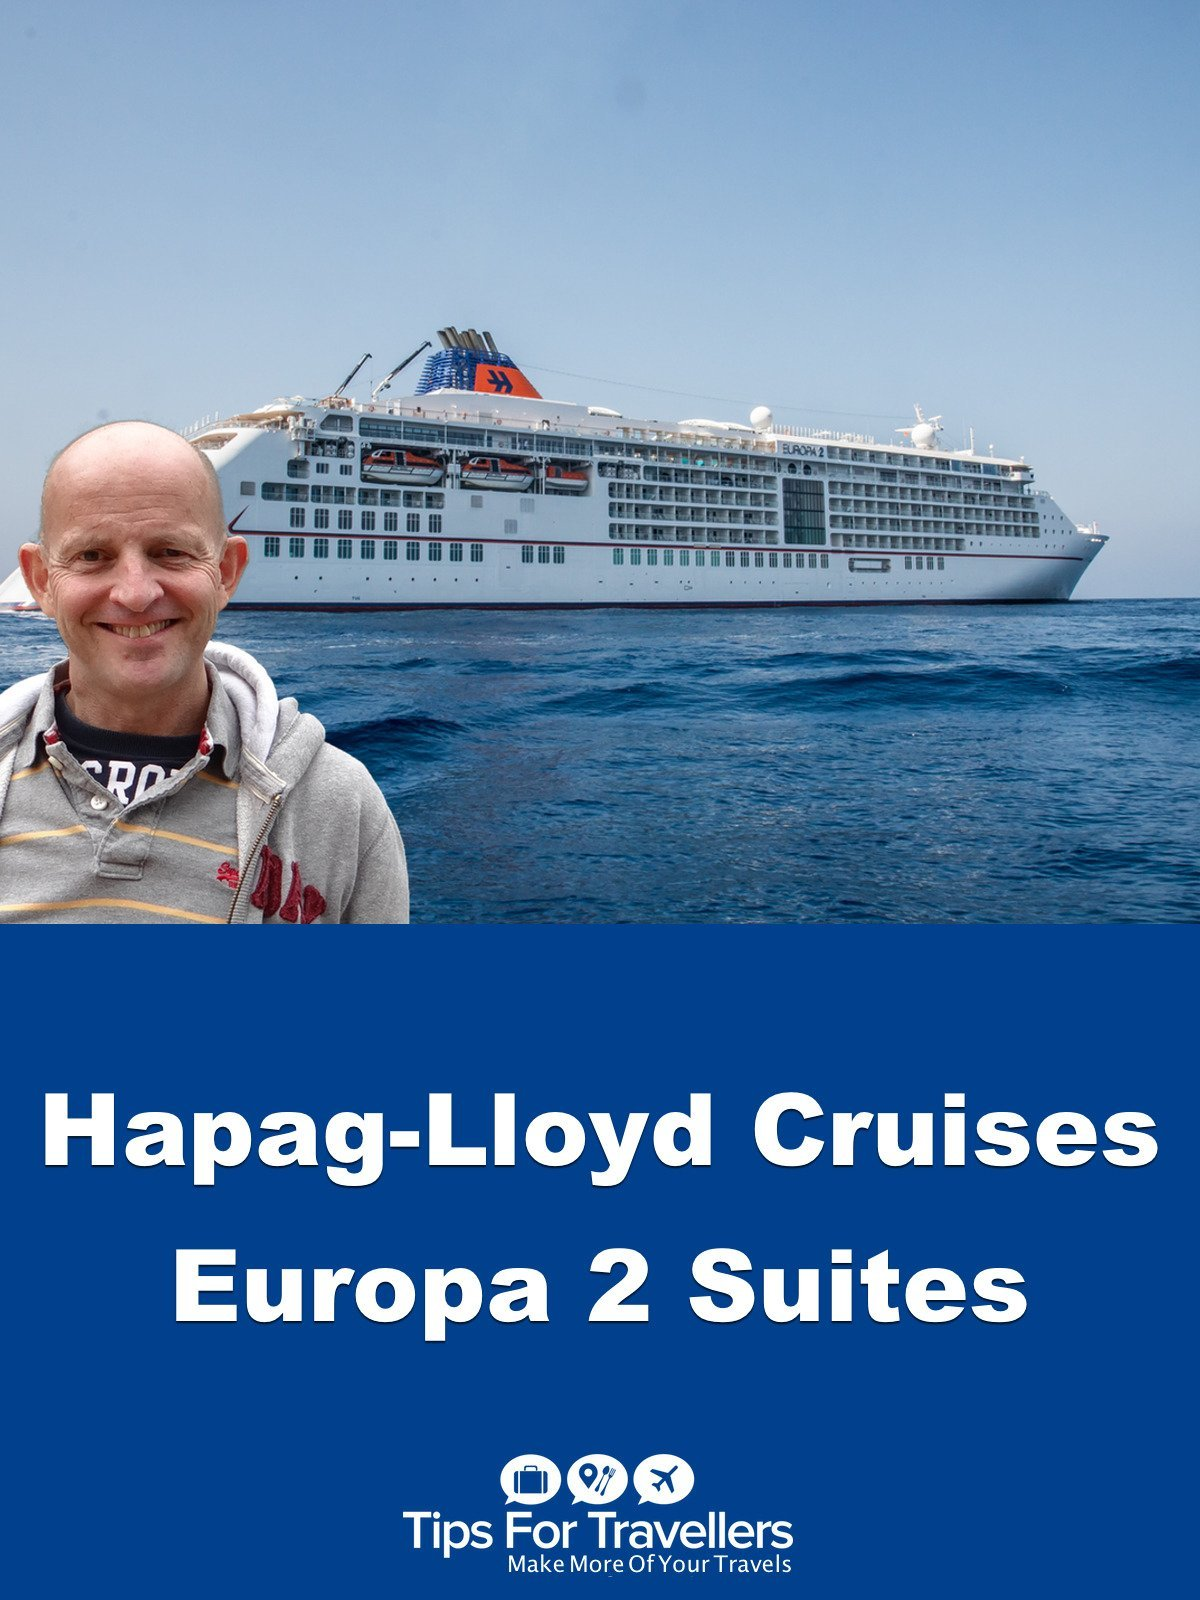 Clip: Hapag-Lloyd Cruises Europa 2 Suites